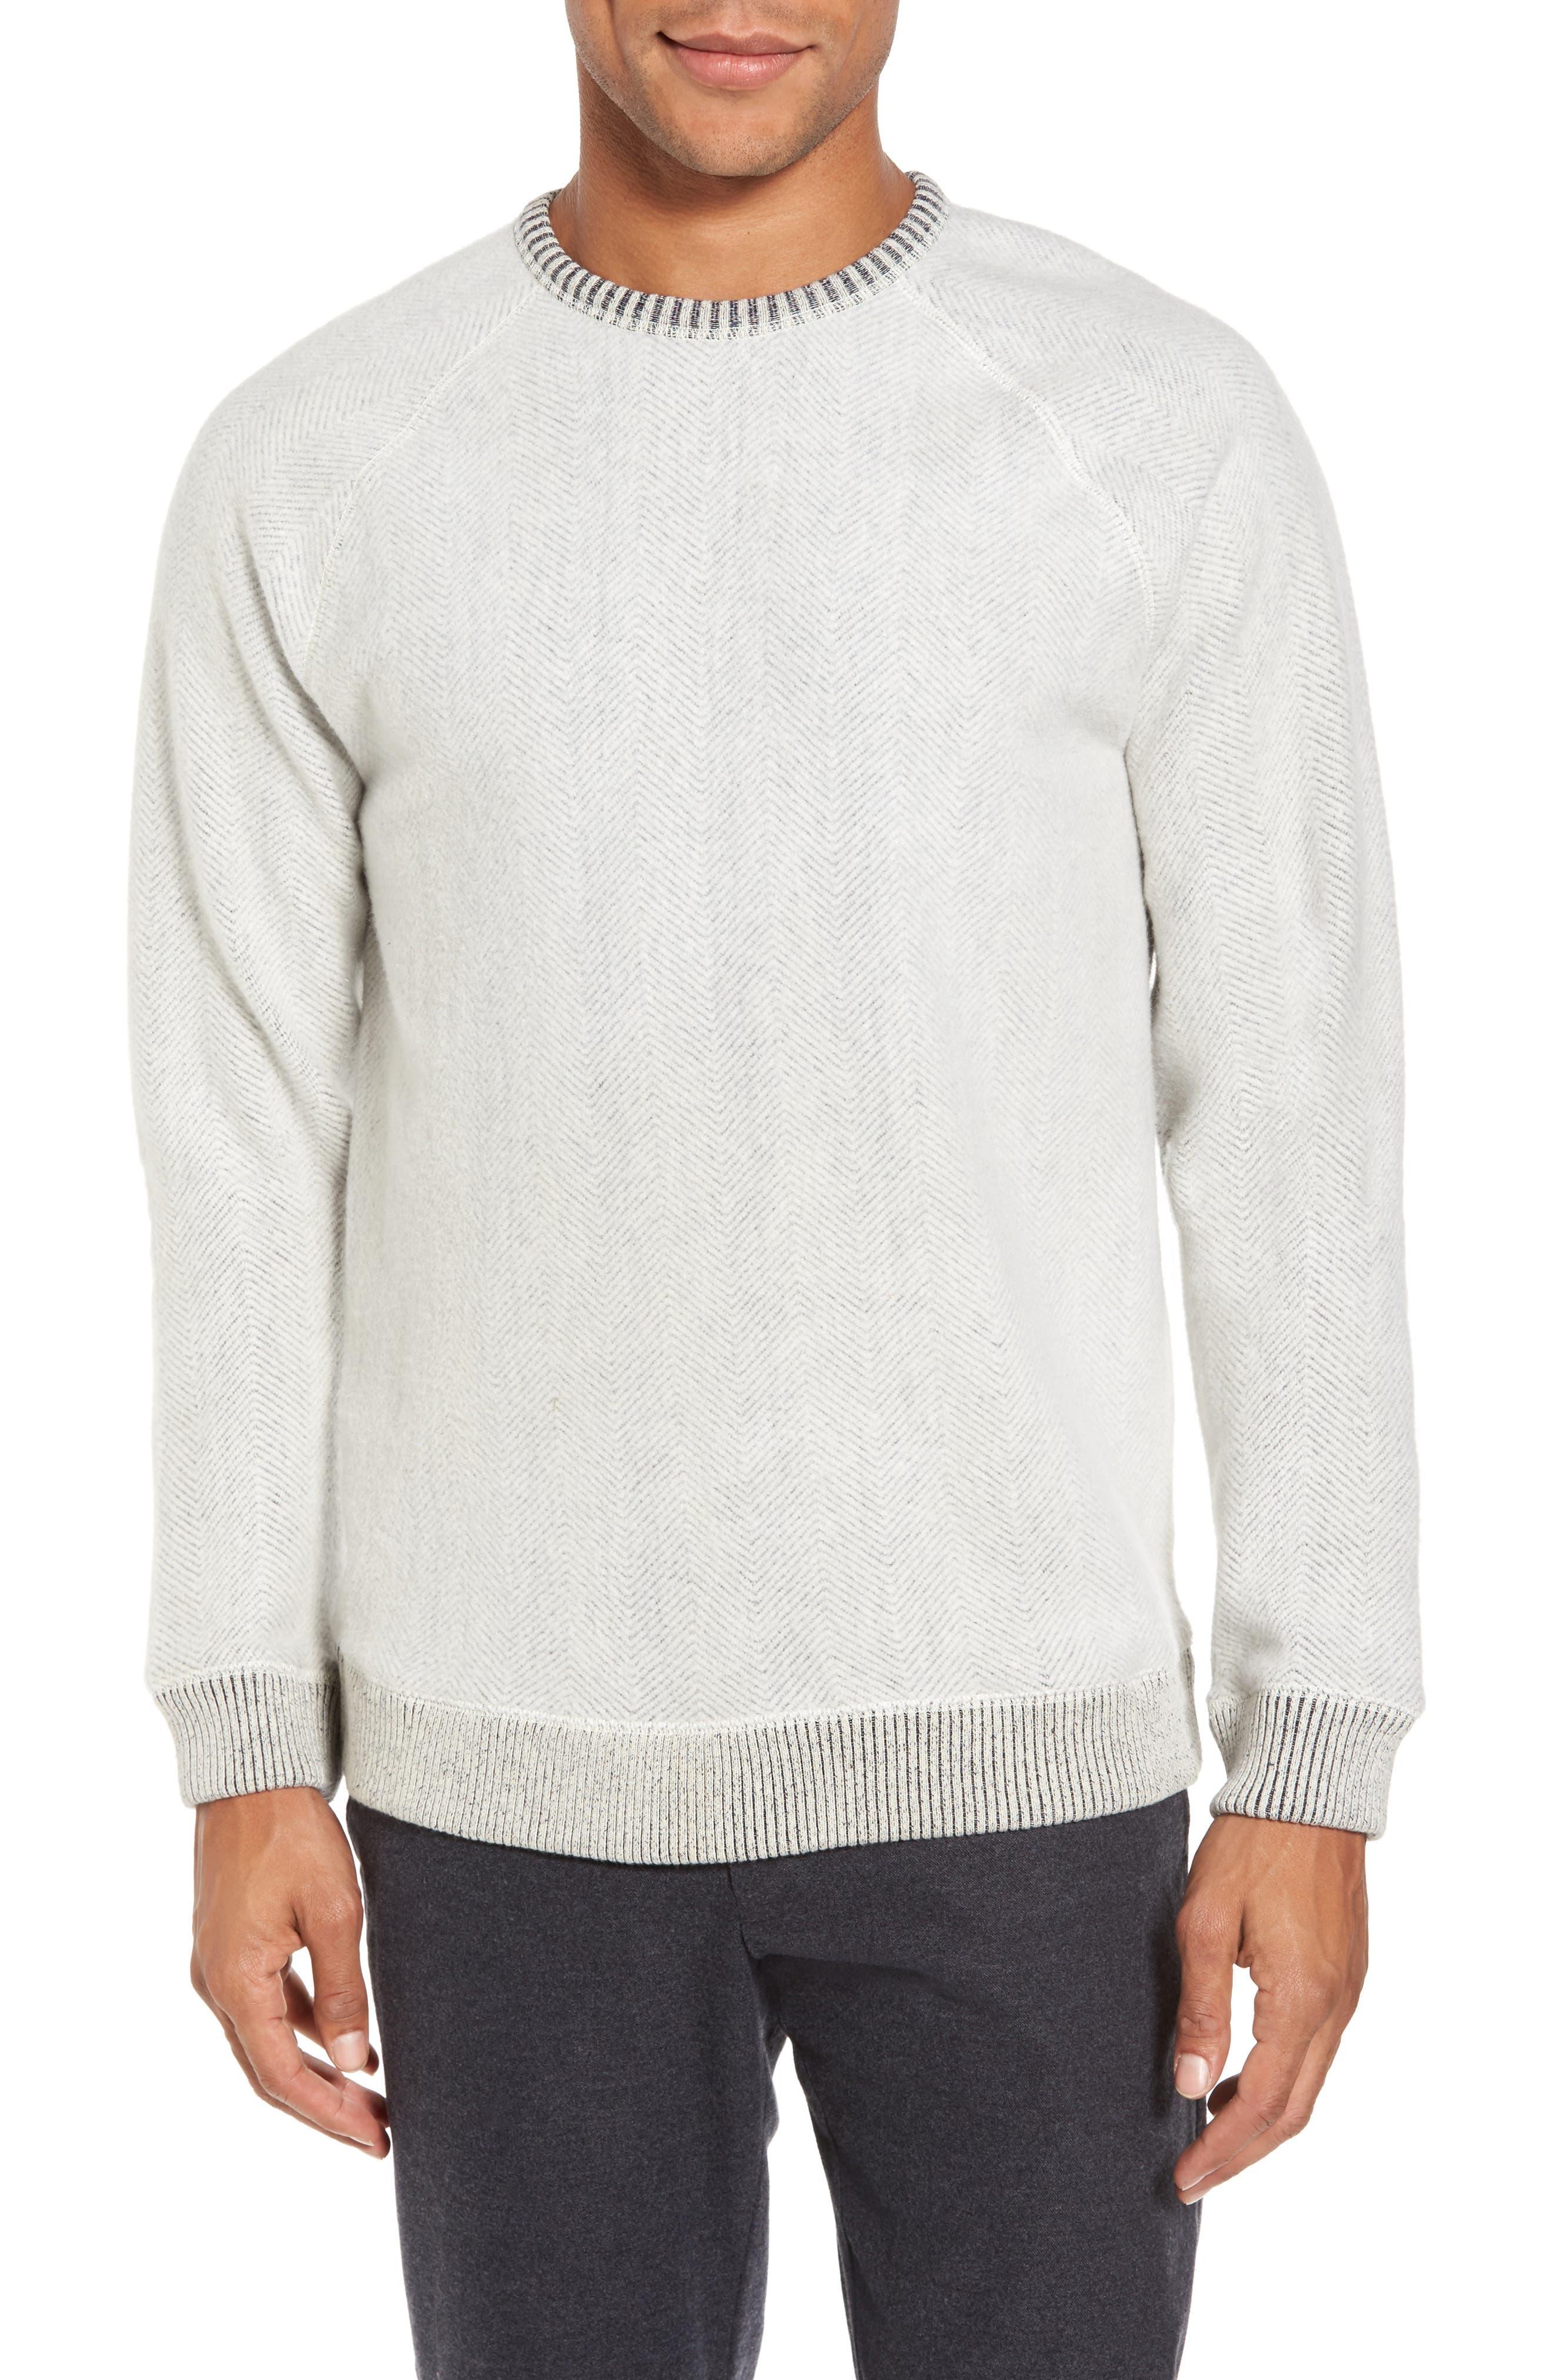 Brushed Fleece Sweatshirt,                             Main thumbnail 1, color,                             Ivory Egret